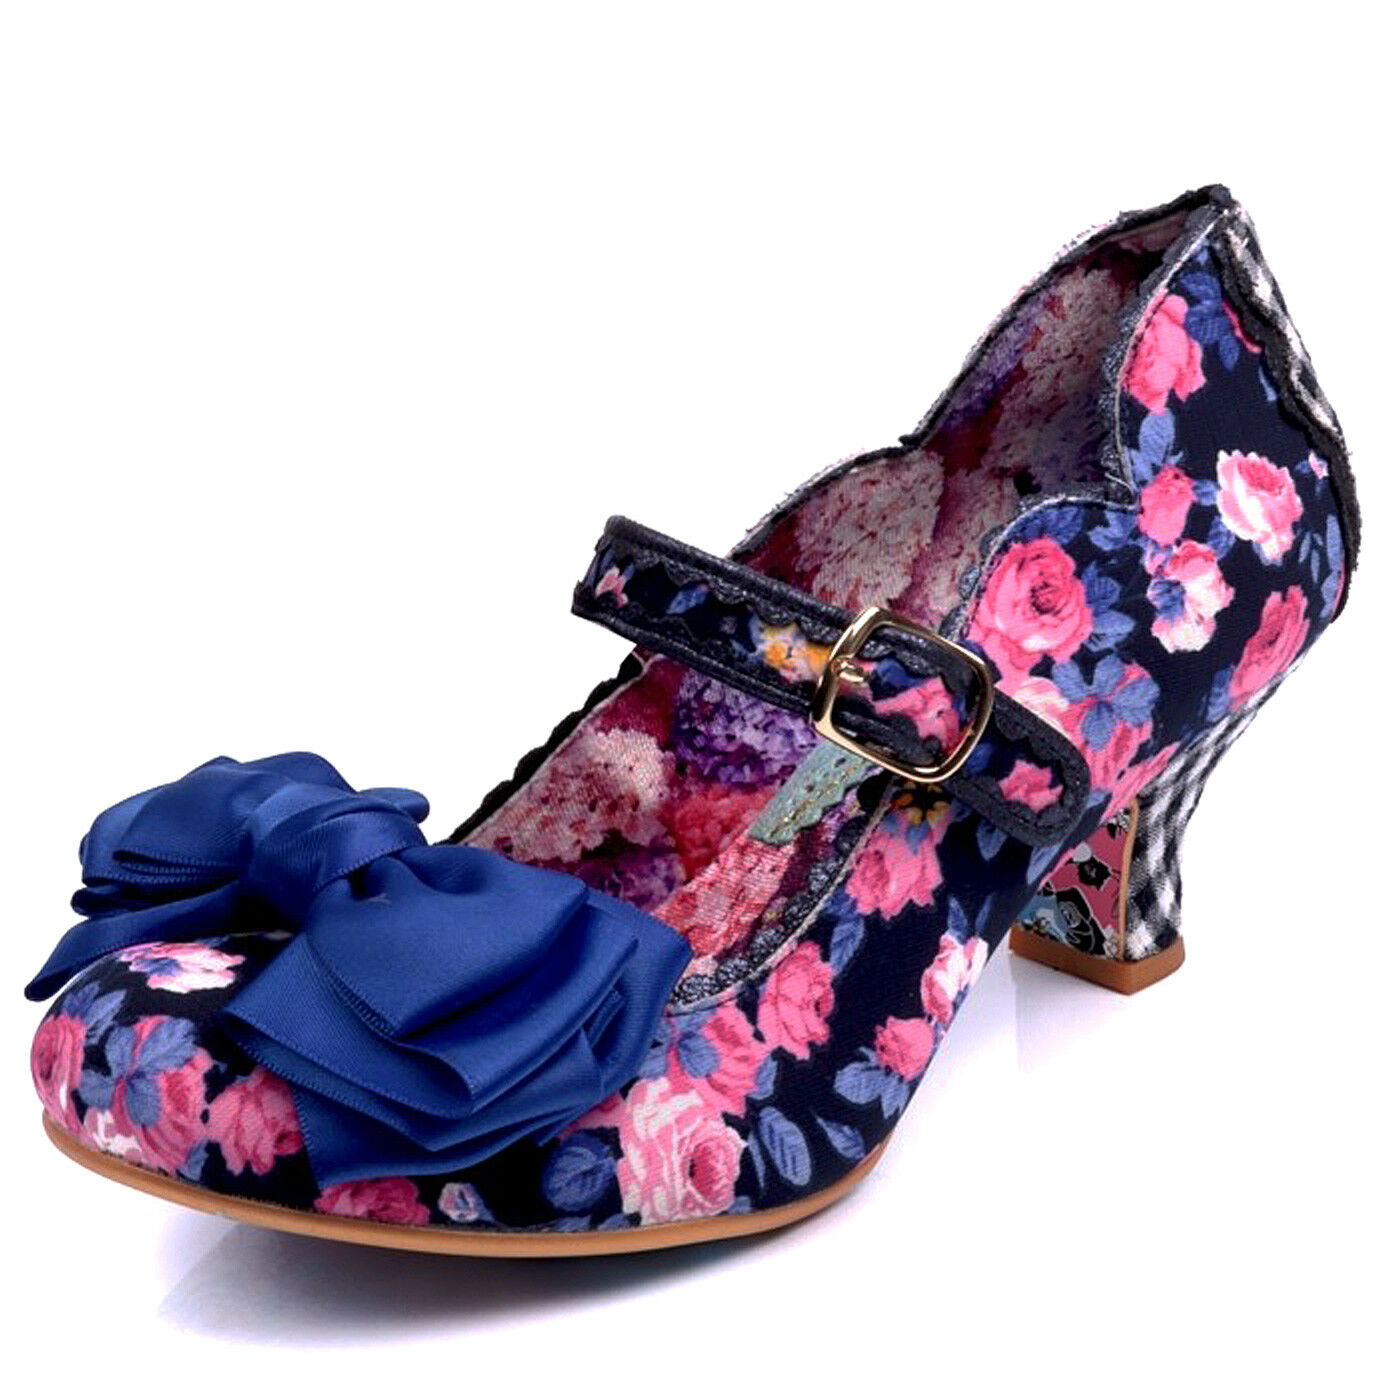 Irregular Choice NEW Summer Breeze Blau navy floral mid heel mary jane schuhe 3-9